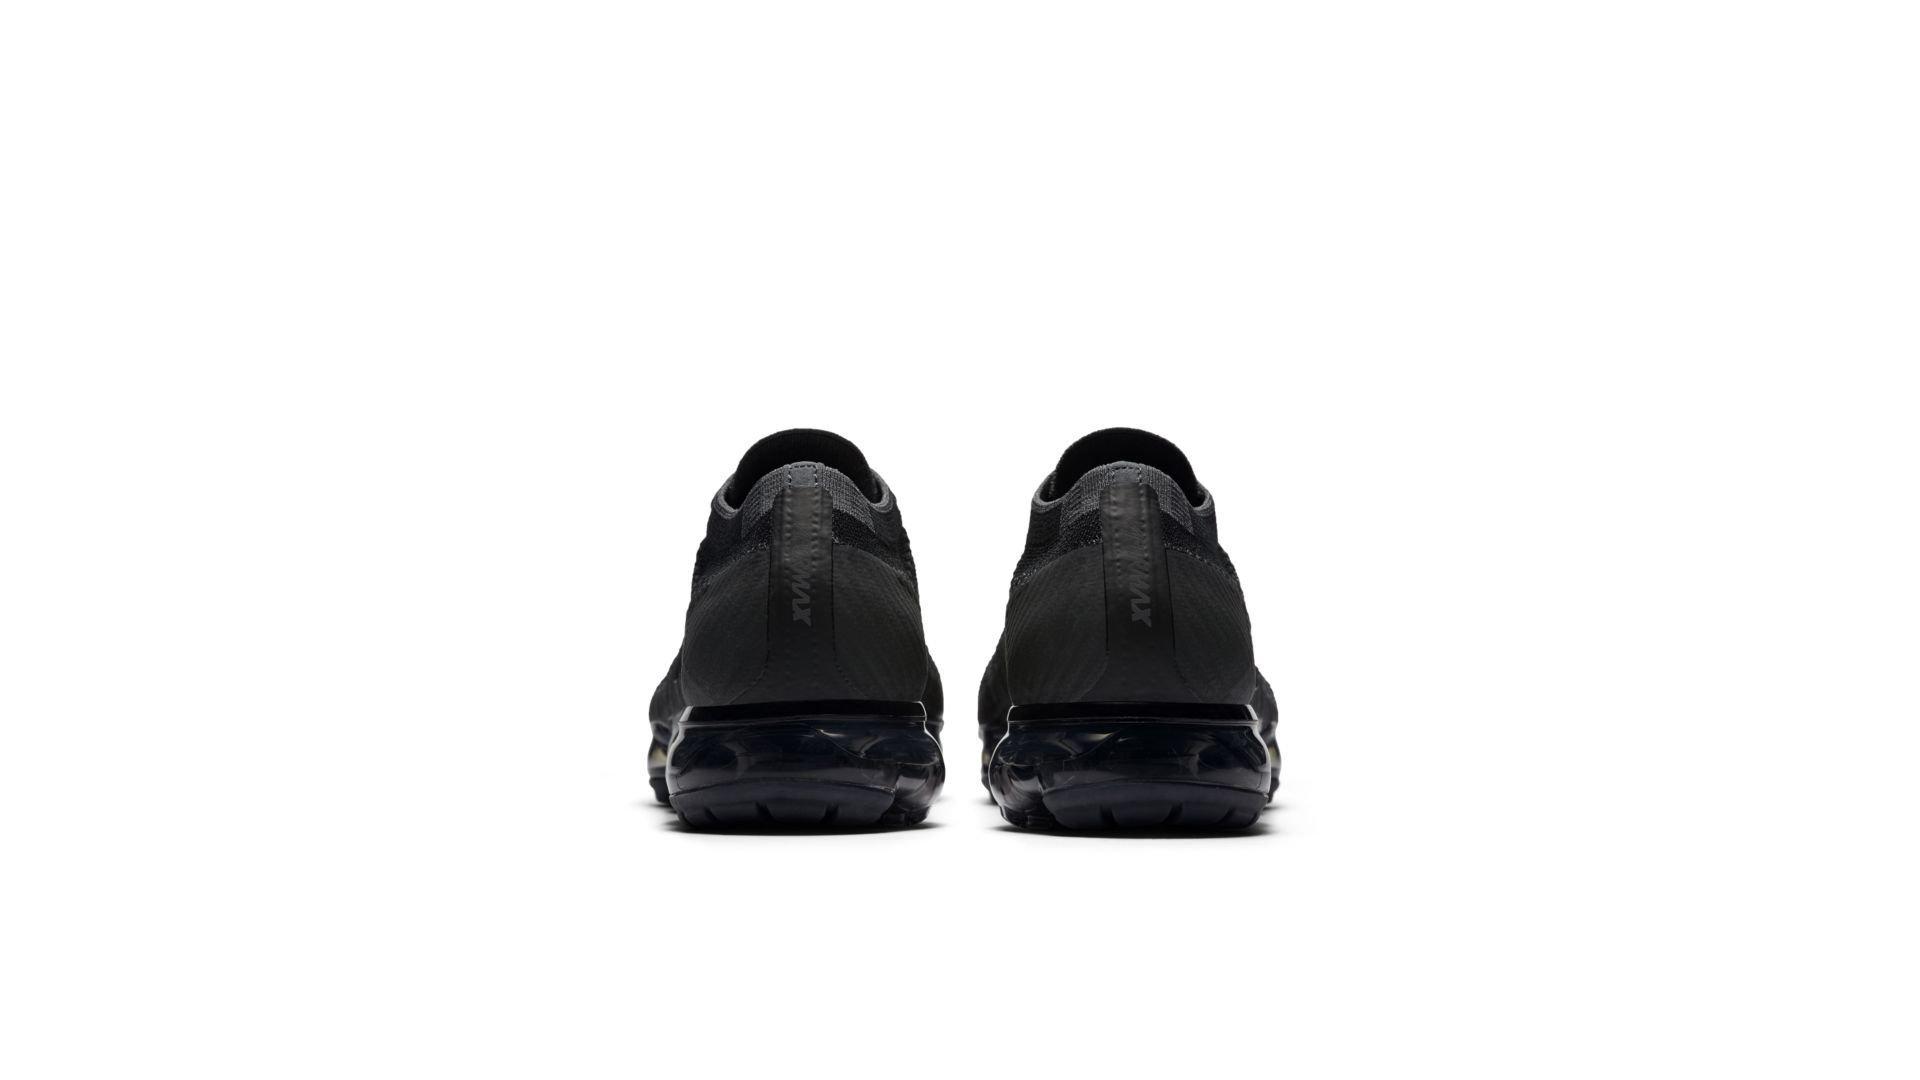 Nike Air Vapormax Triple Black (849558-007)